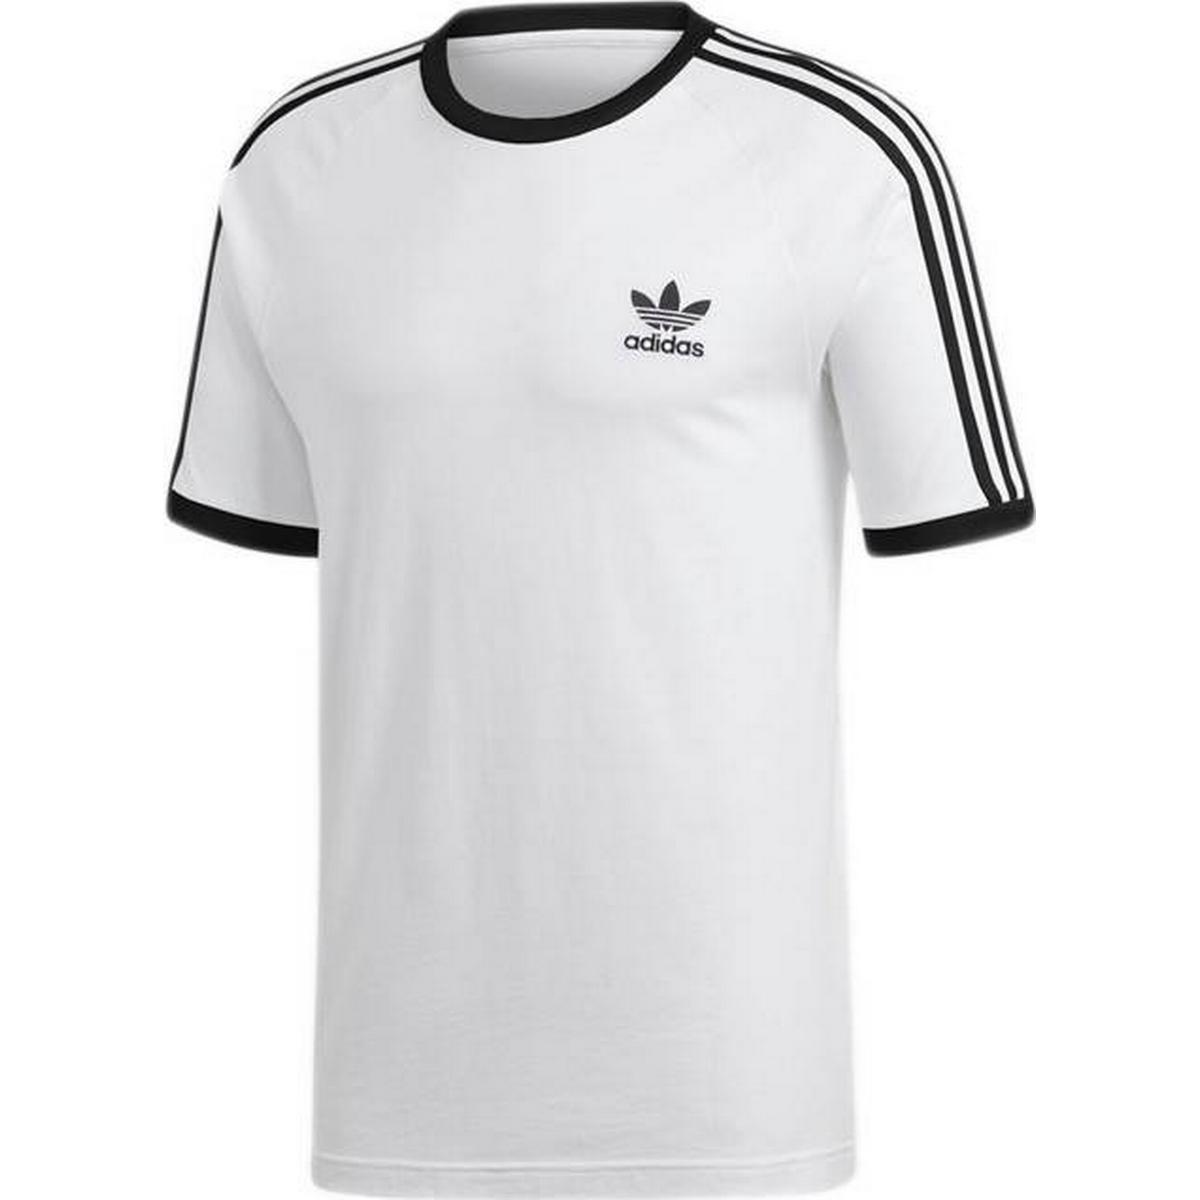 Adidas t shirt Herrkläder • Hitta lägsta pris hos